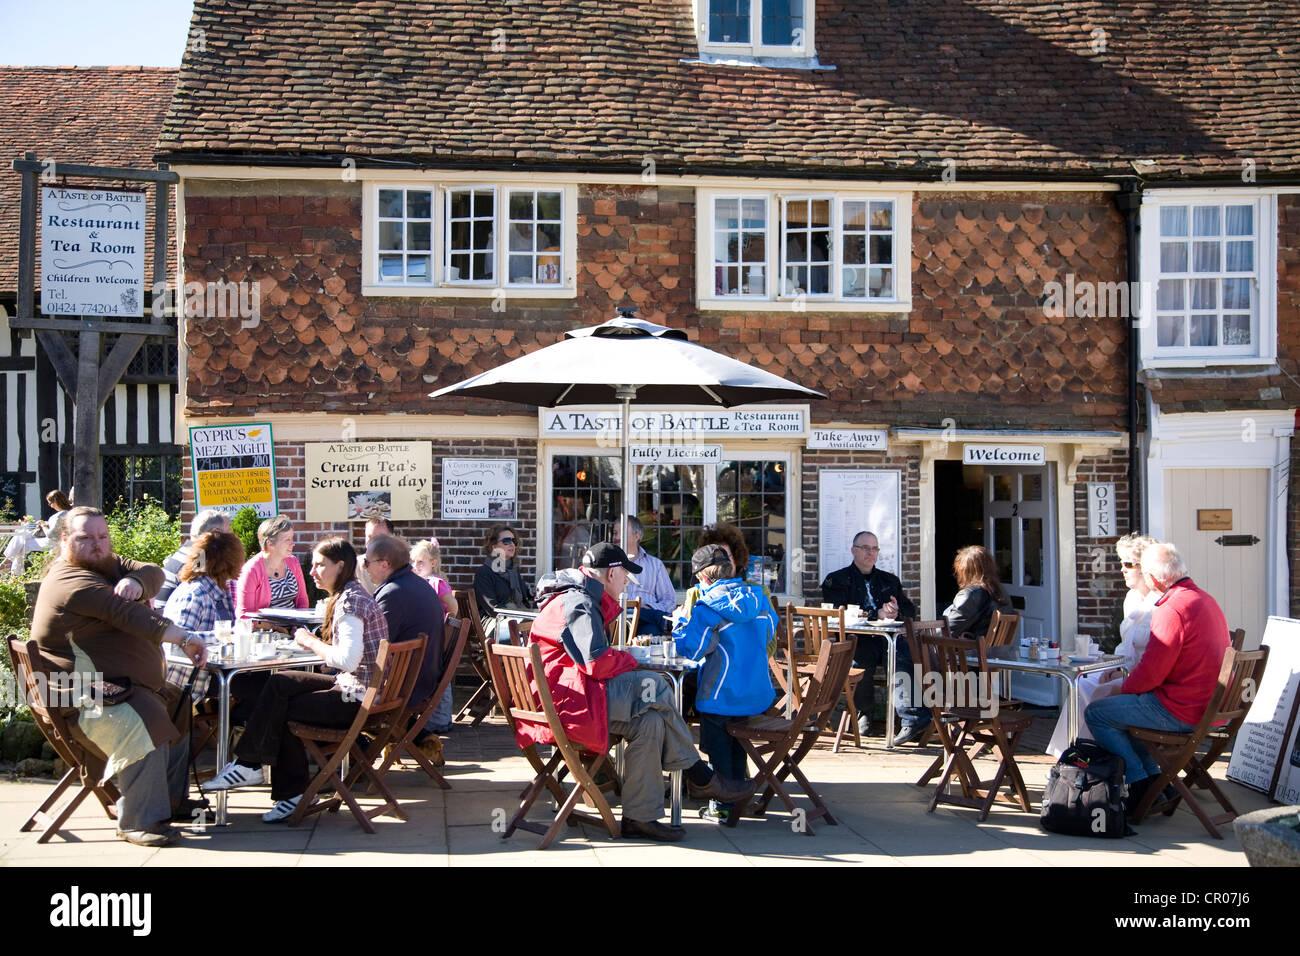 People seated outside Tea Room. High Street. Battle. East Sussex. England. - Stock Image